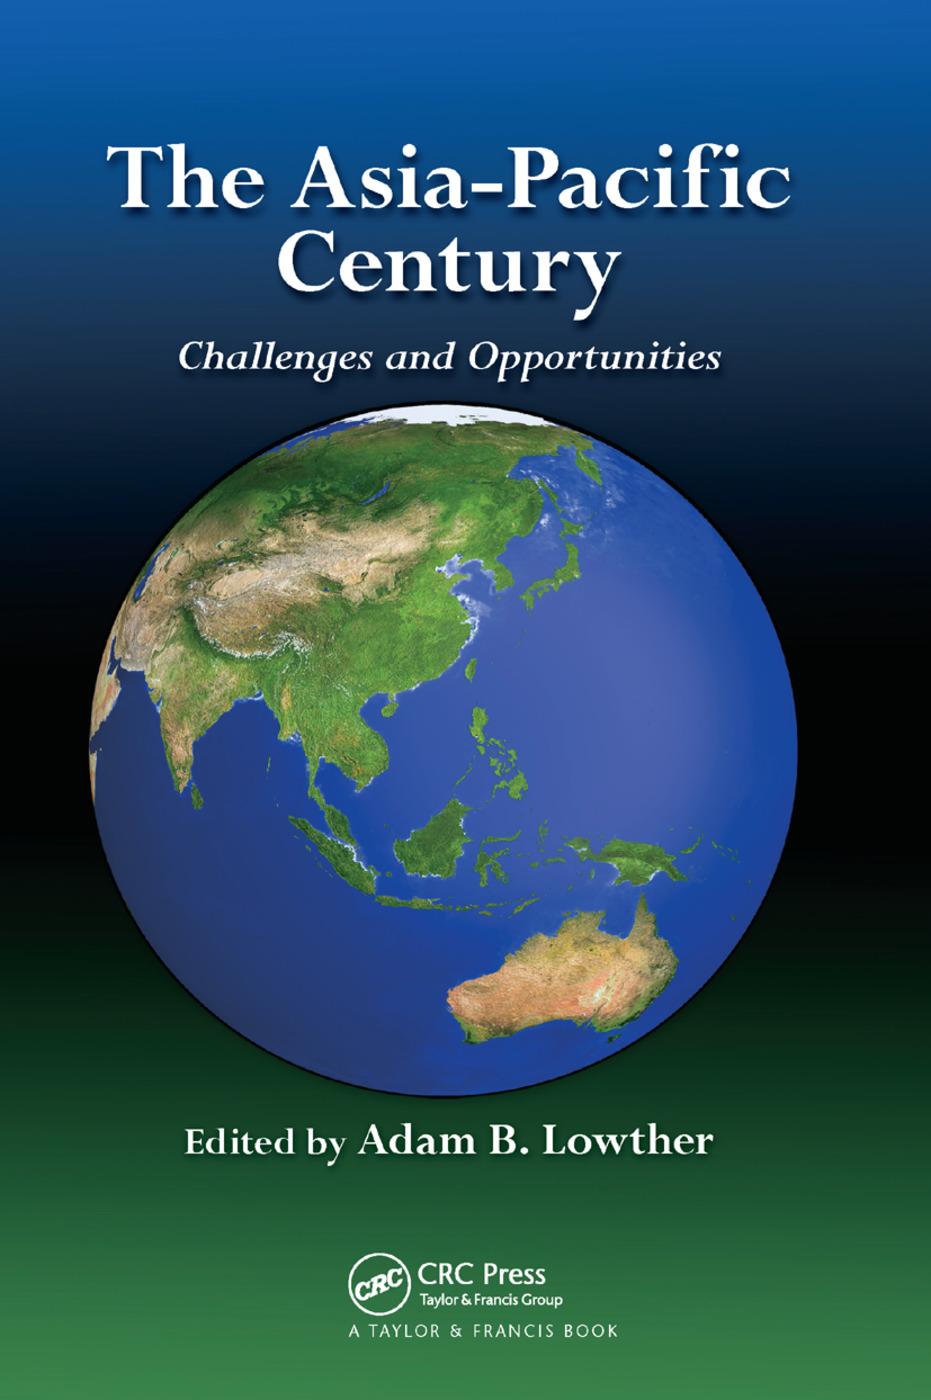 The Asia-Pacific Century